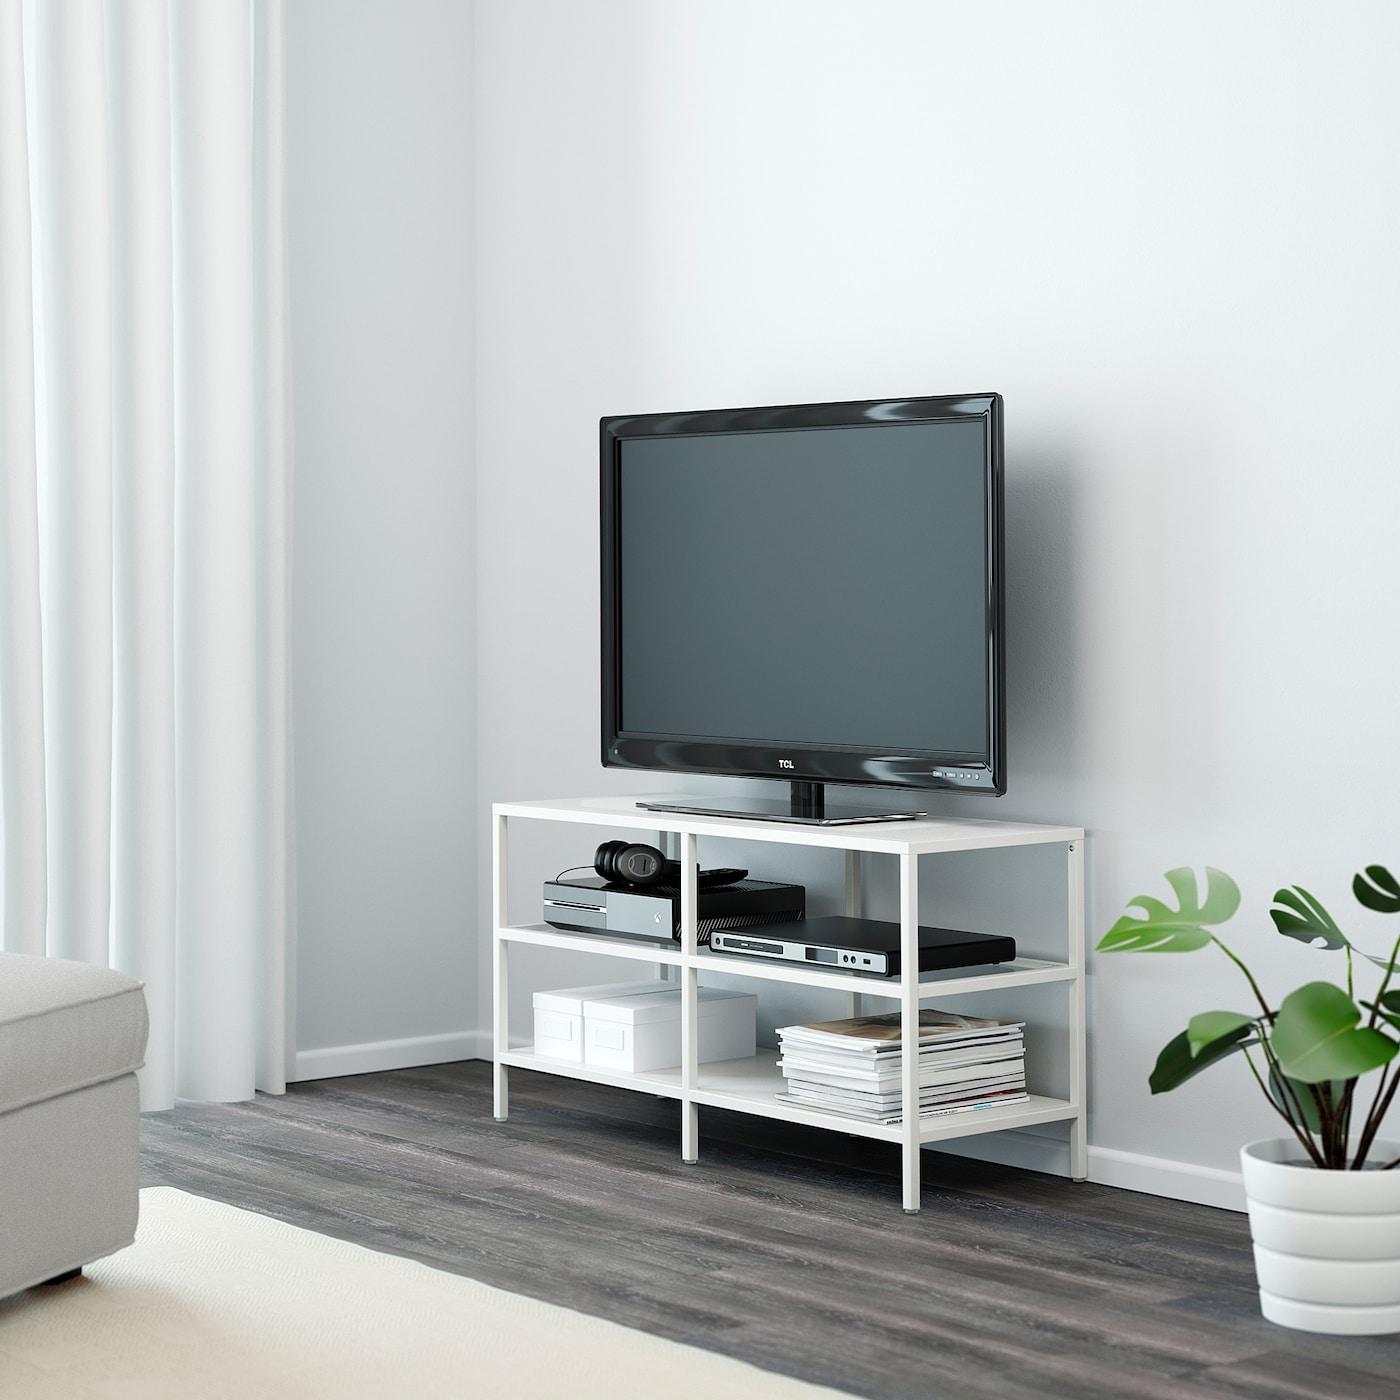 Hoek Tv Meubel Glas.Vittsjo Tv Meubel Wit Glas 100x36x53 Cm Ikea